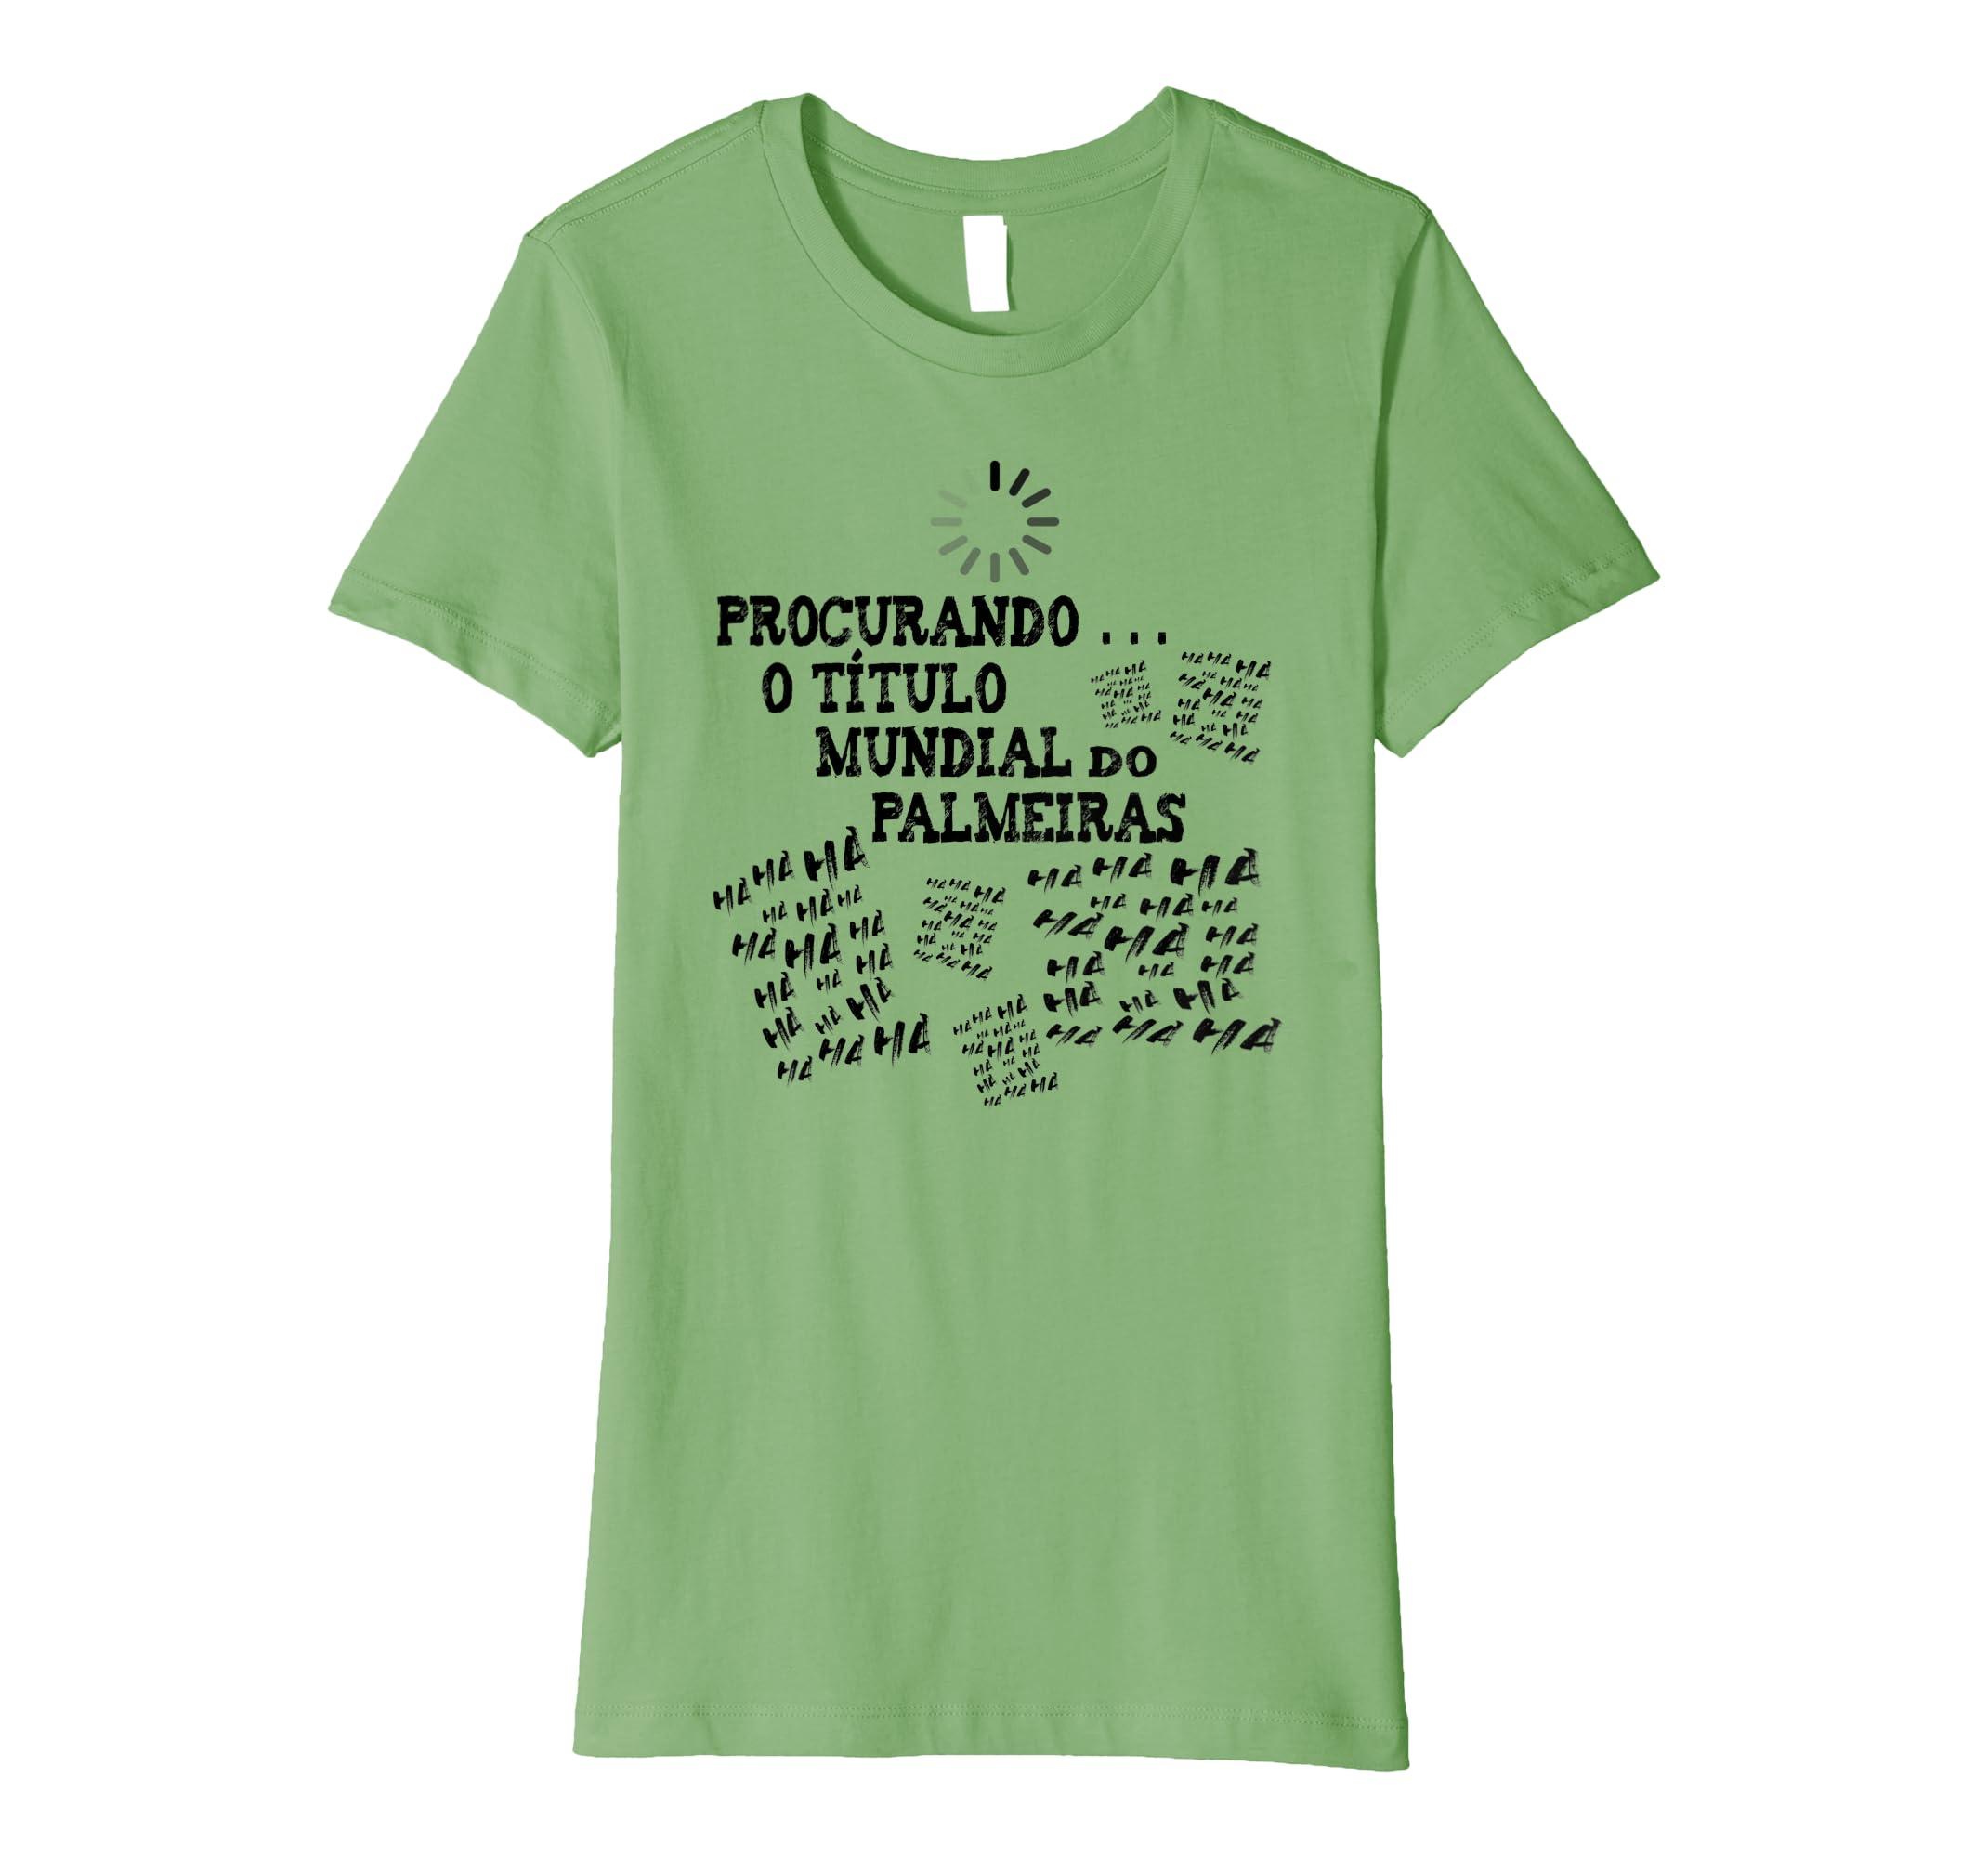 Amazoncom Corinthians Soccer T Shirt Jokes Santos Sao Paulo Clothing